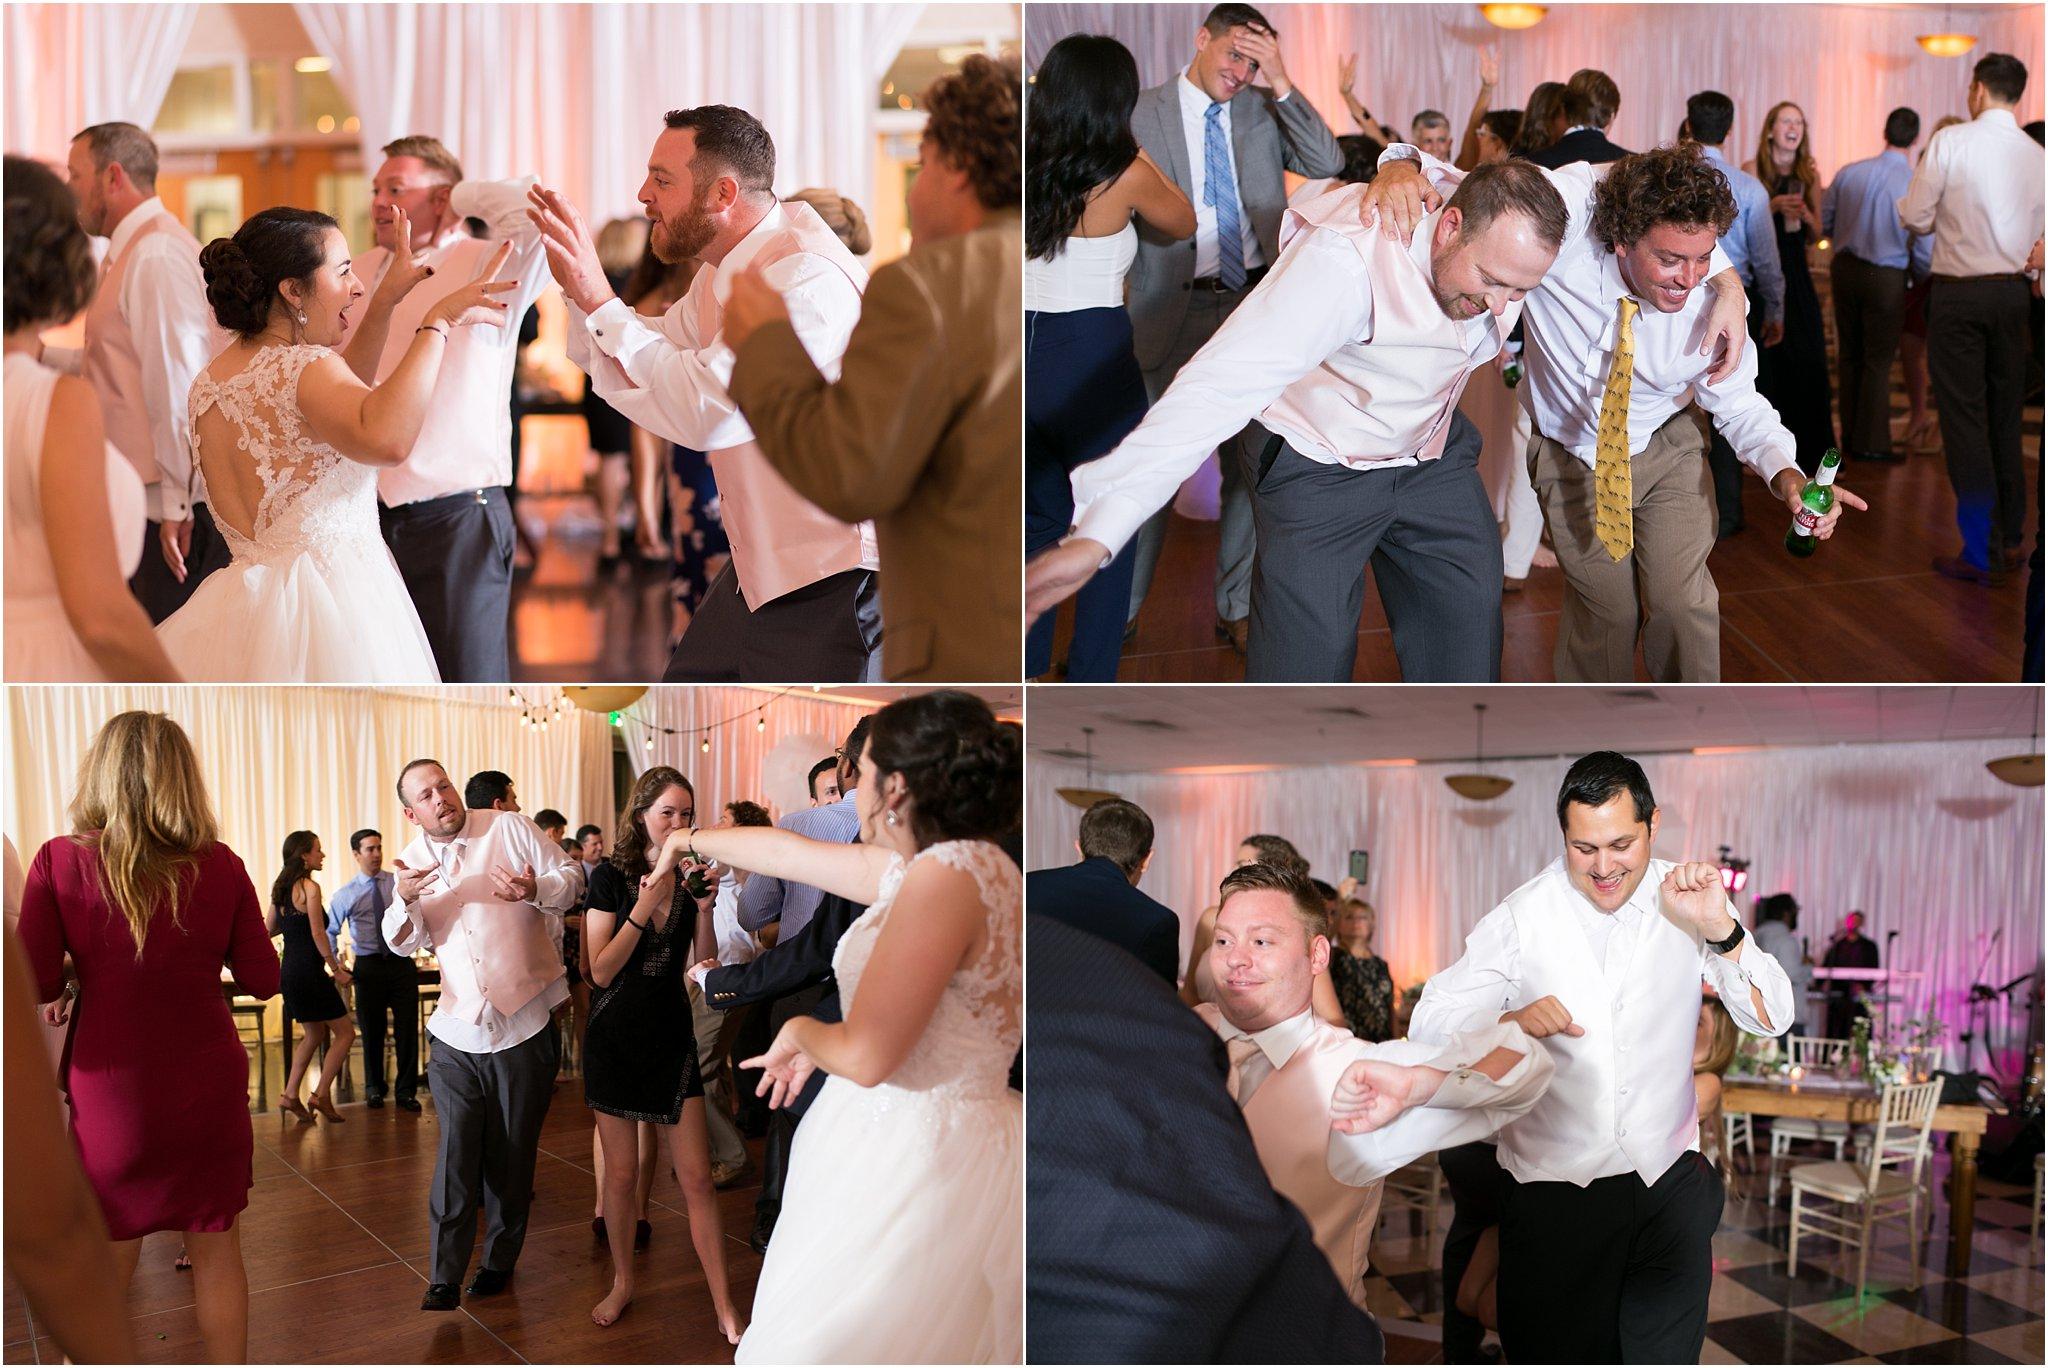 jessica_ryan_photography_virginia_wedding_photographer_wedding_hurricane_norfolk_botanical_gardens_hurricane_matthew_wedding_3643